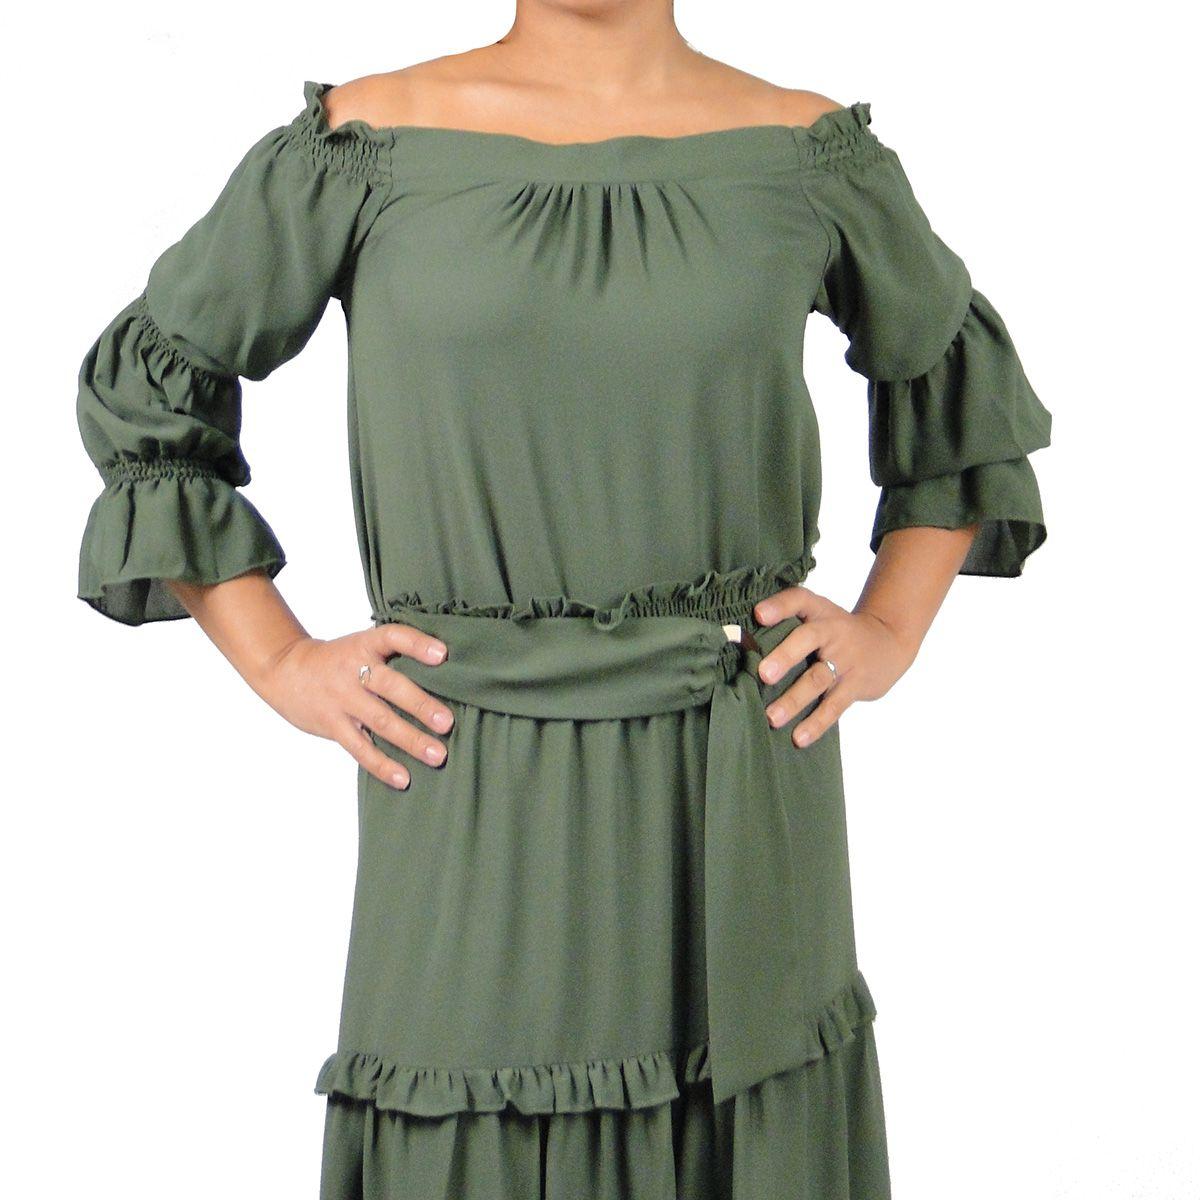 Blusa Fashionista Feminina Verde